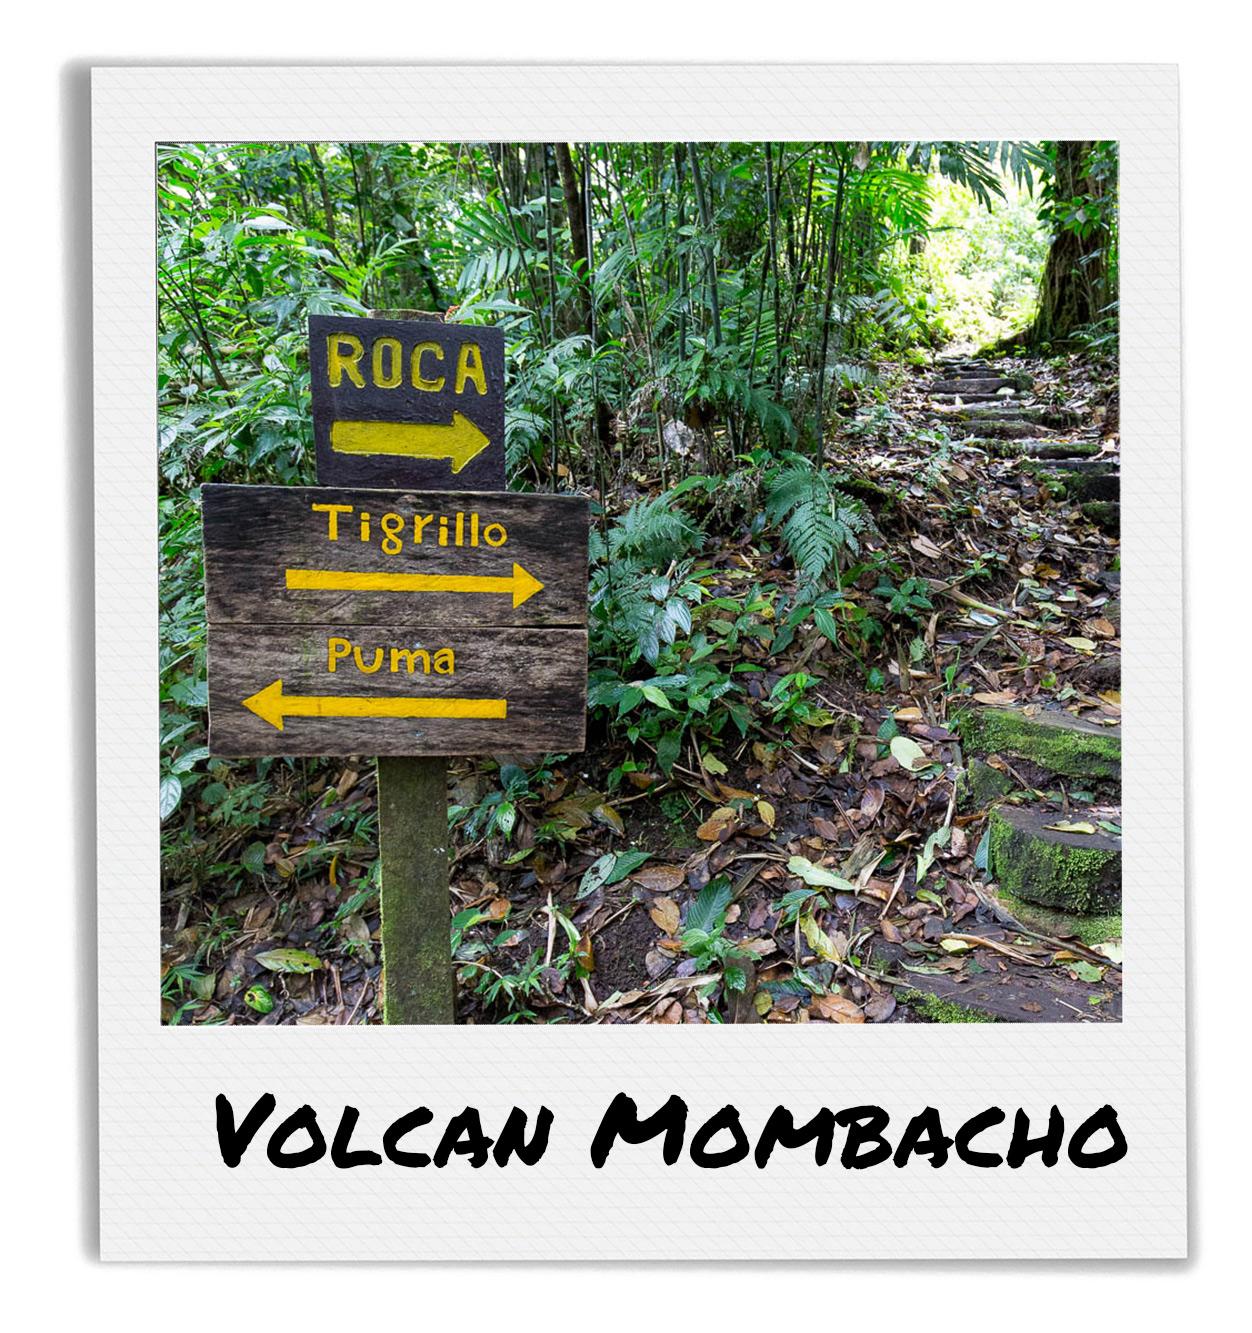 Volcano Mombacho Tour